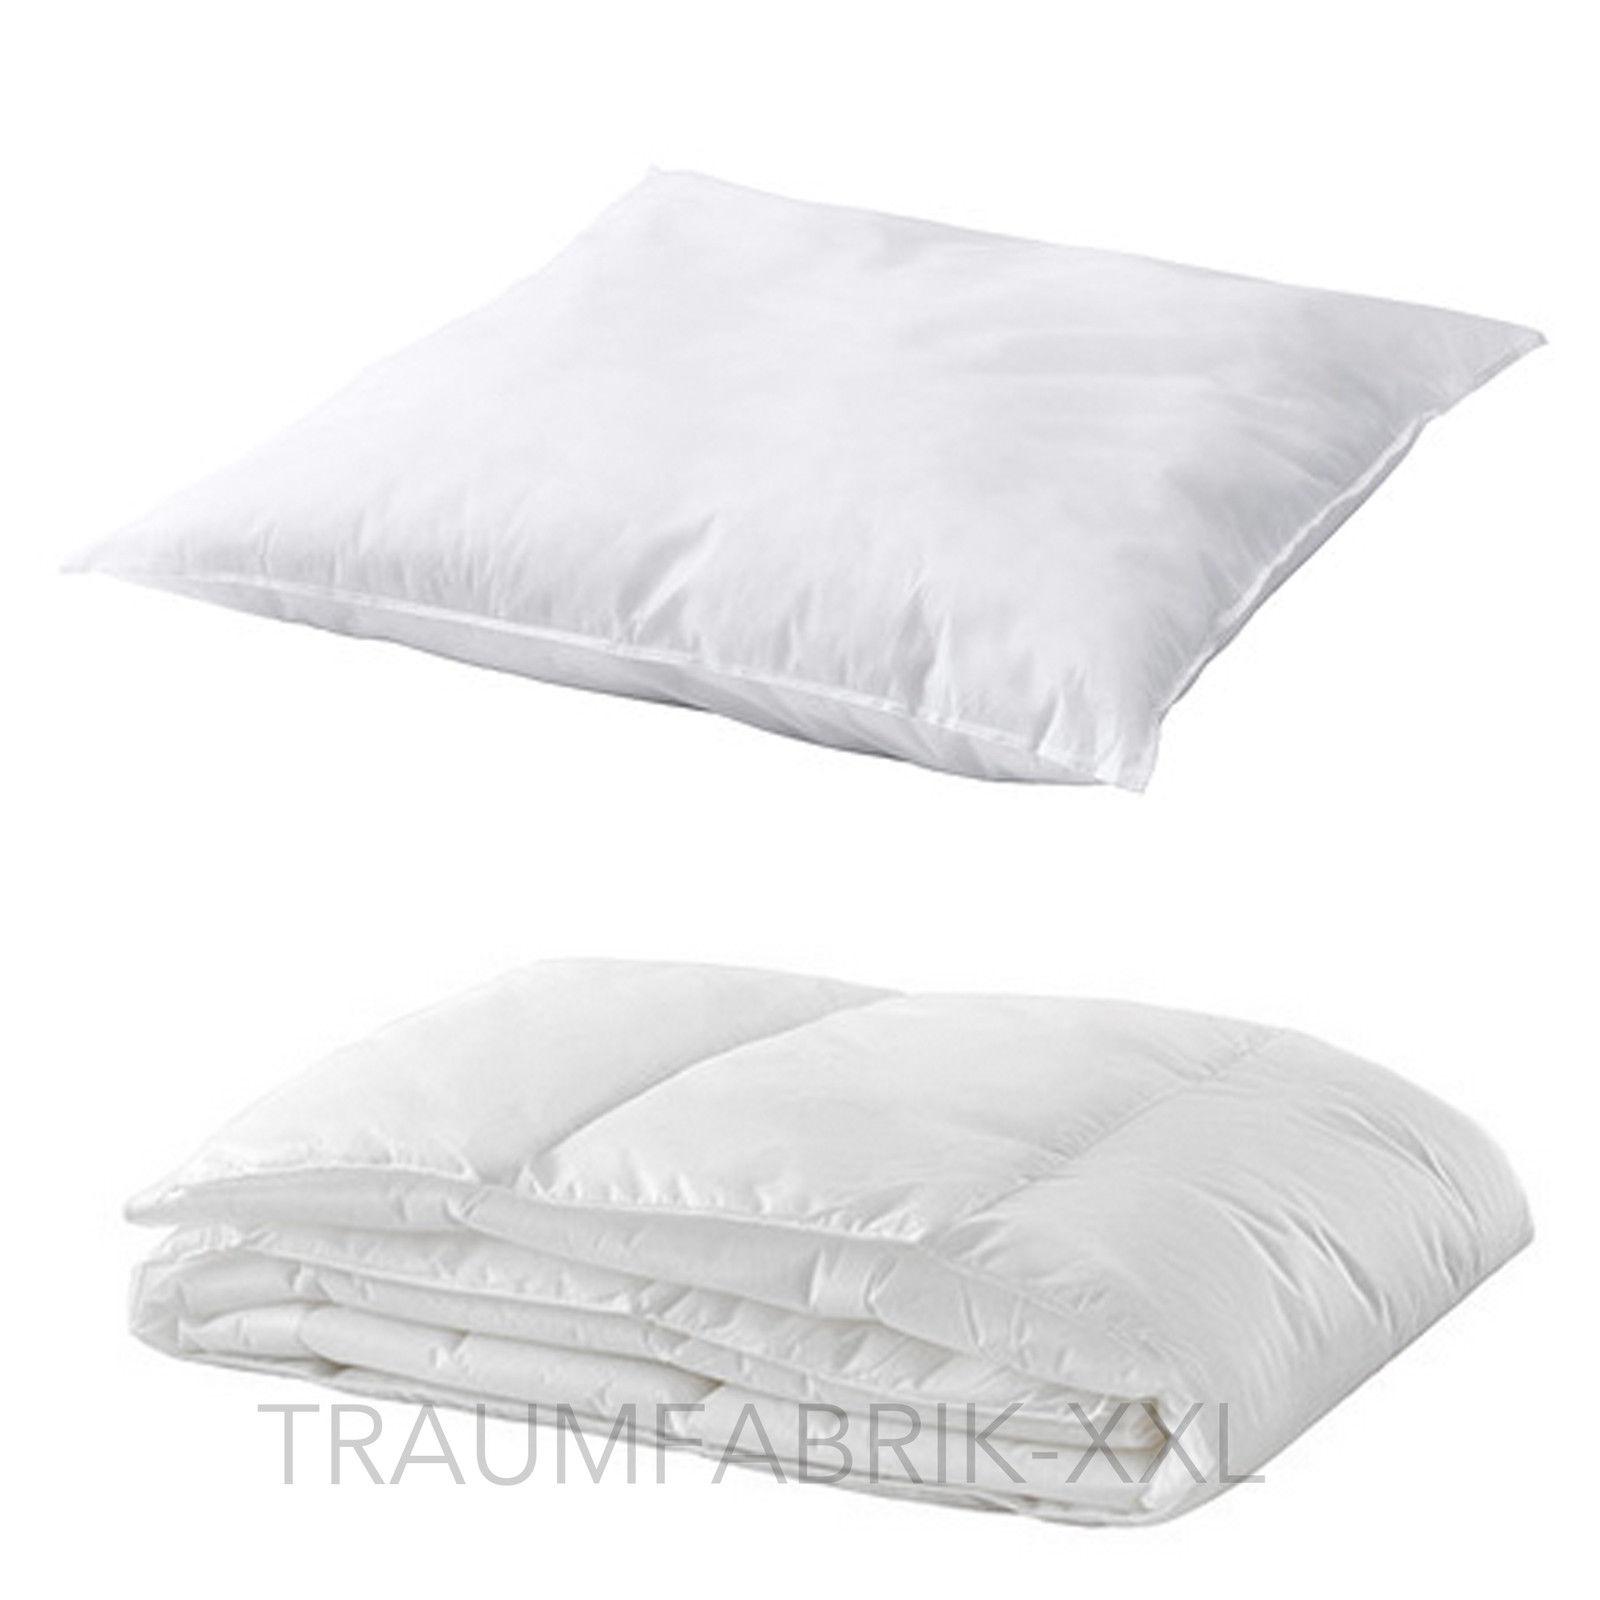 ikea 2er bettenset 1 bettdecke mysa 140 200 cm. Black Bedroom Furniture Sets. Home Design Ideas